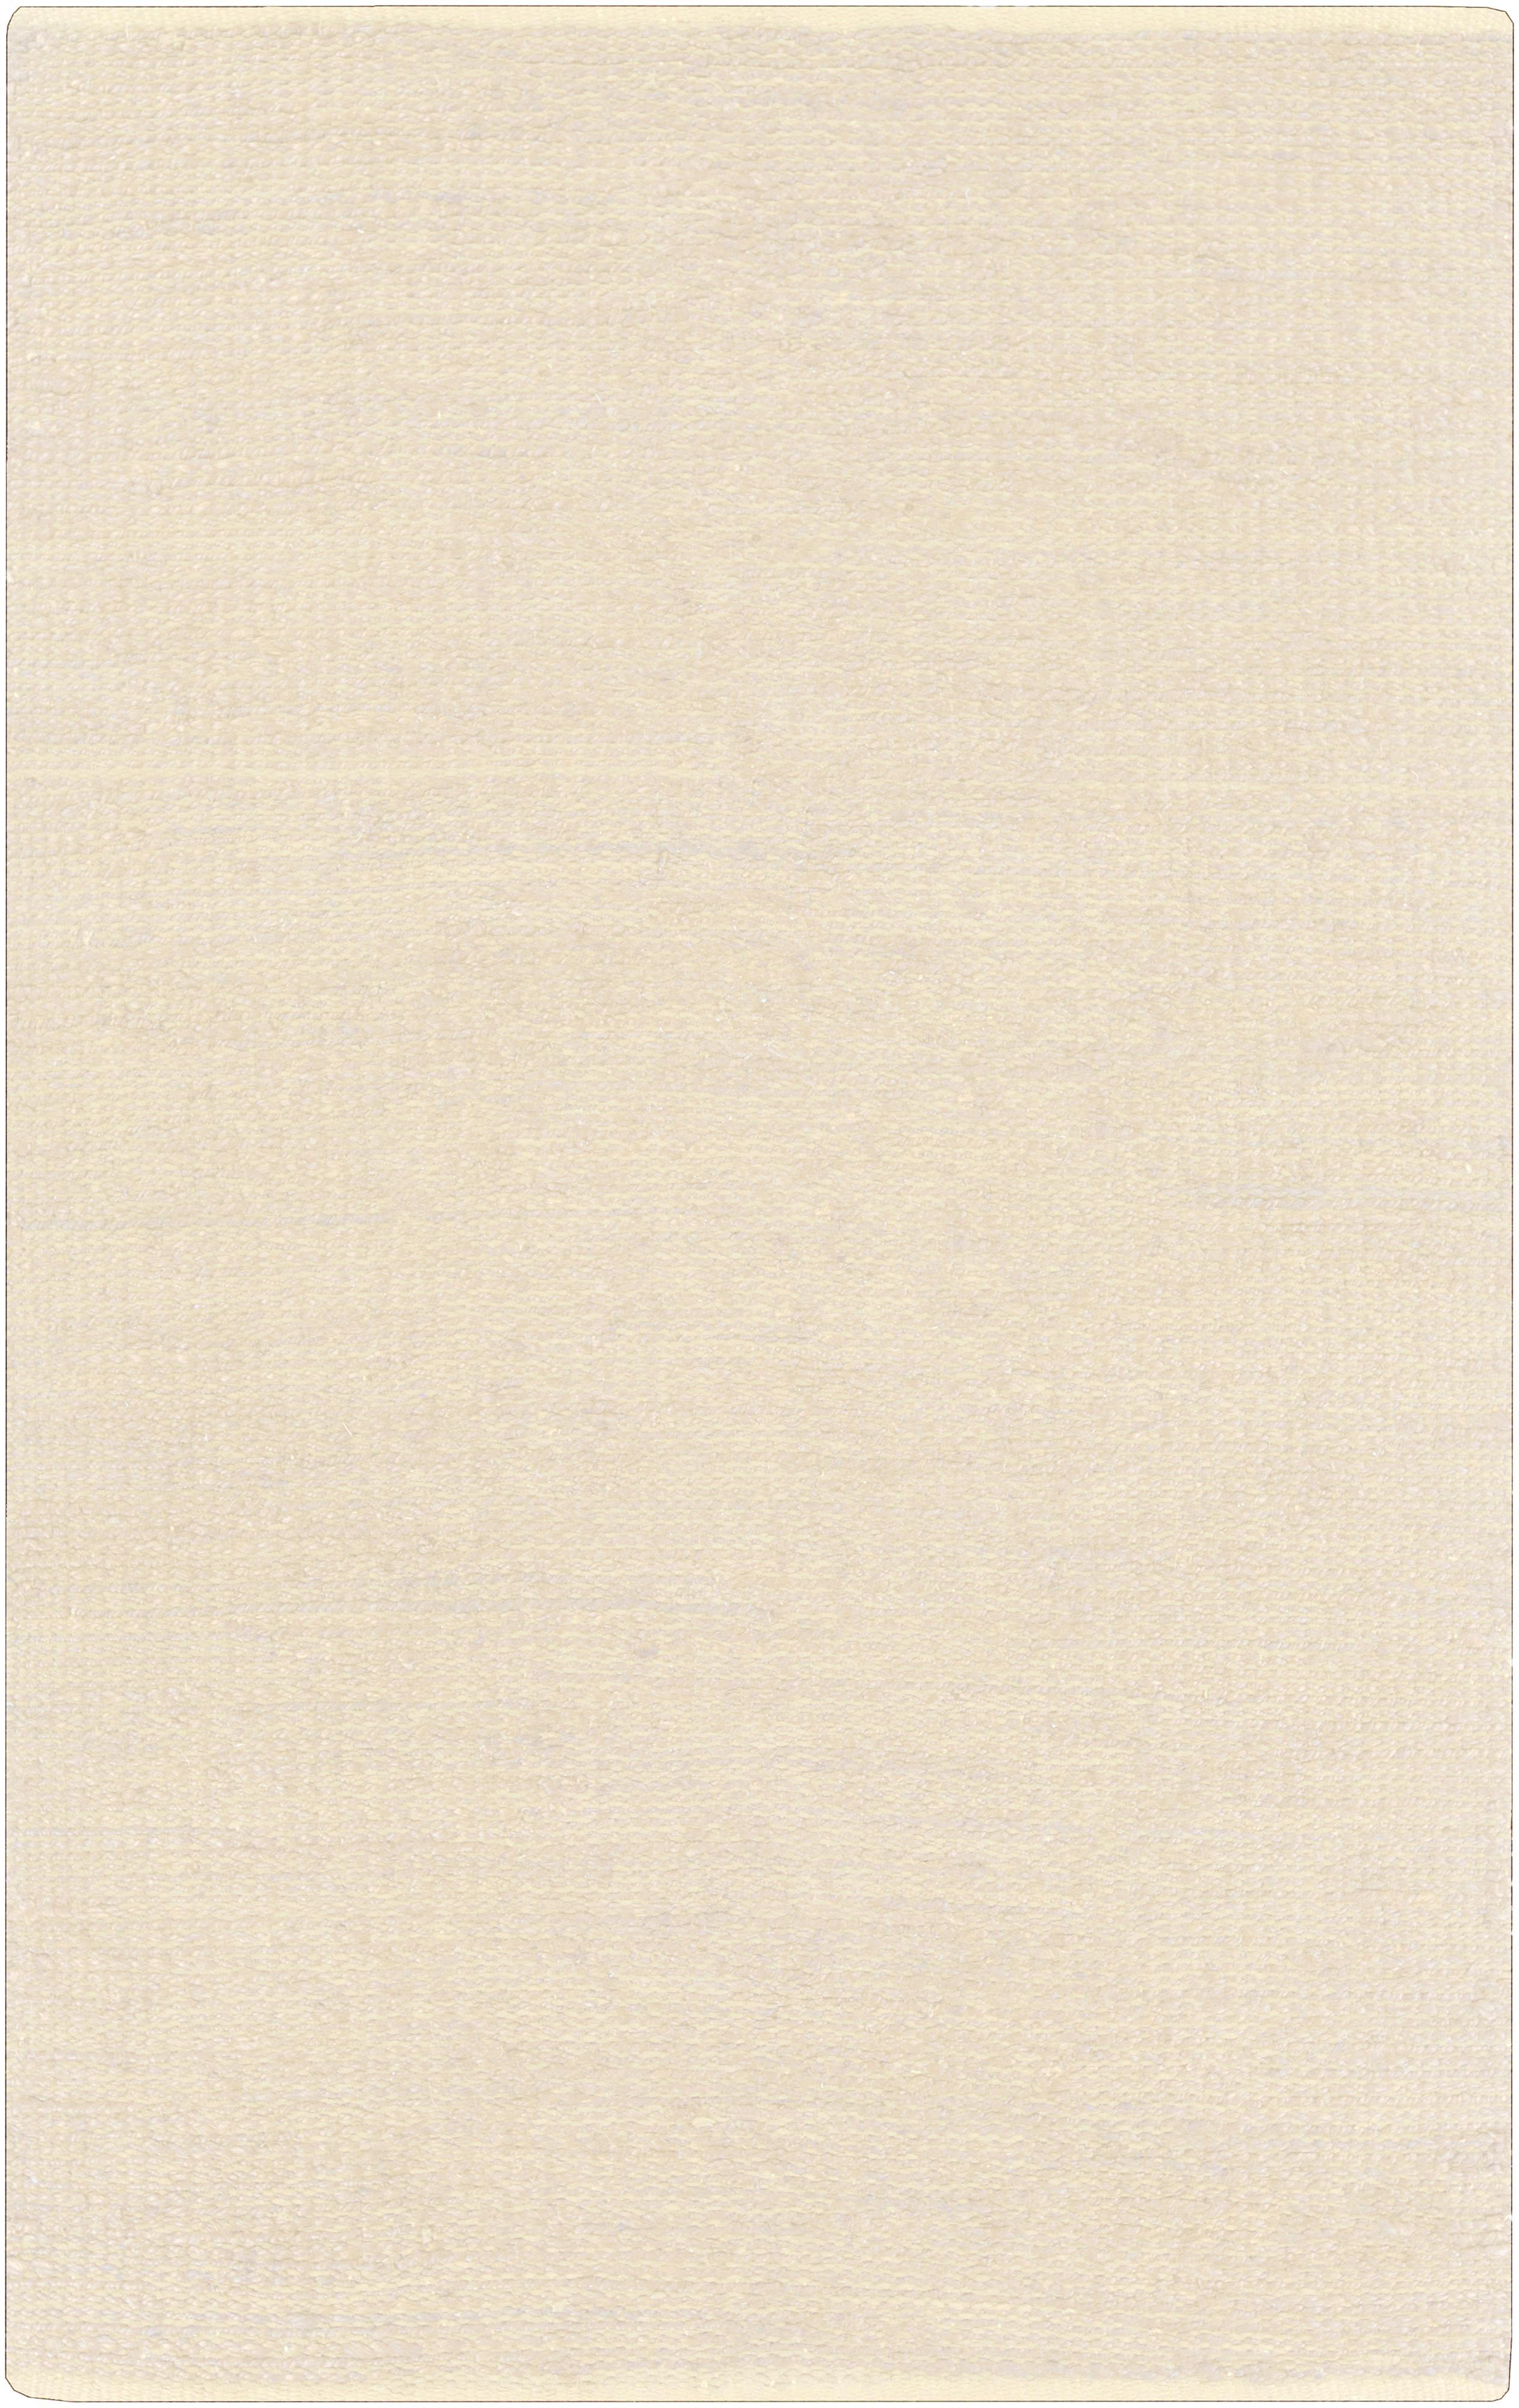 Surya Rugs Tonga 2' x 3' - Item Number: TGA6005-23